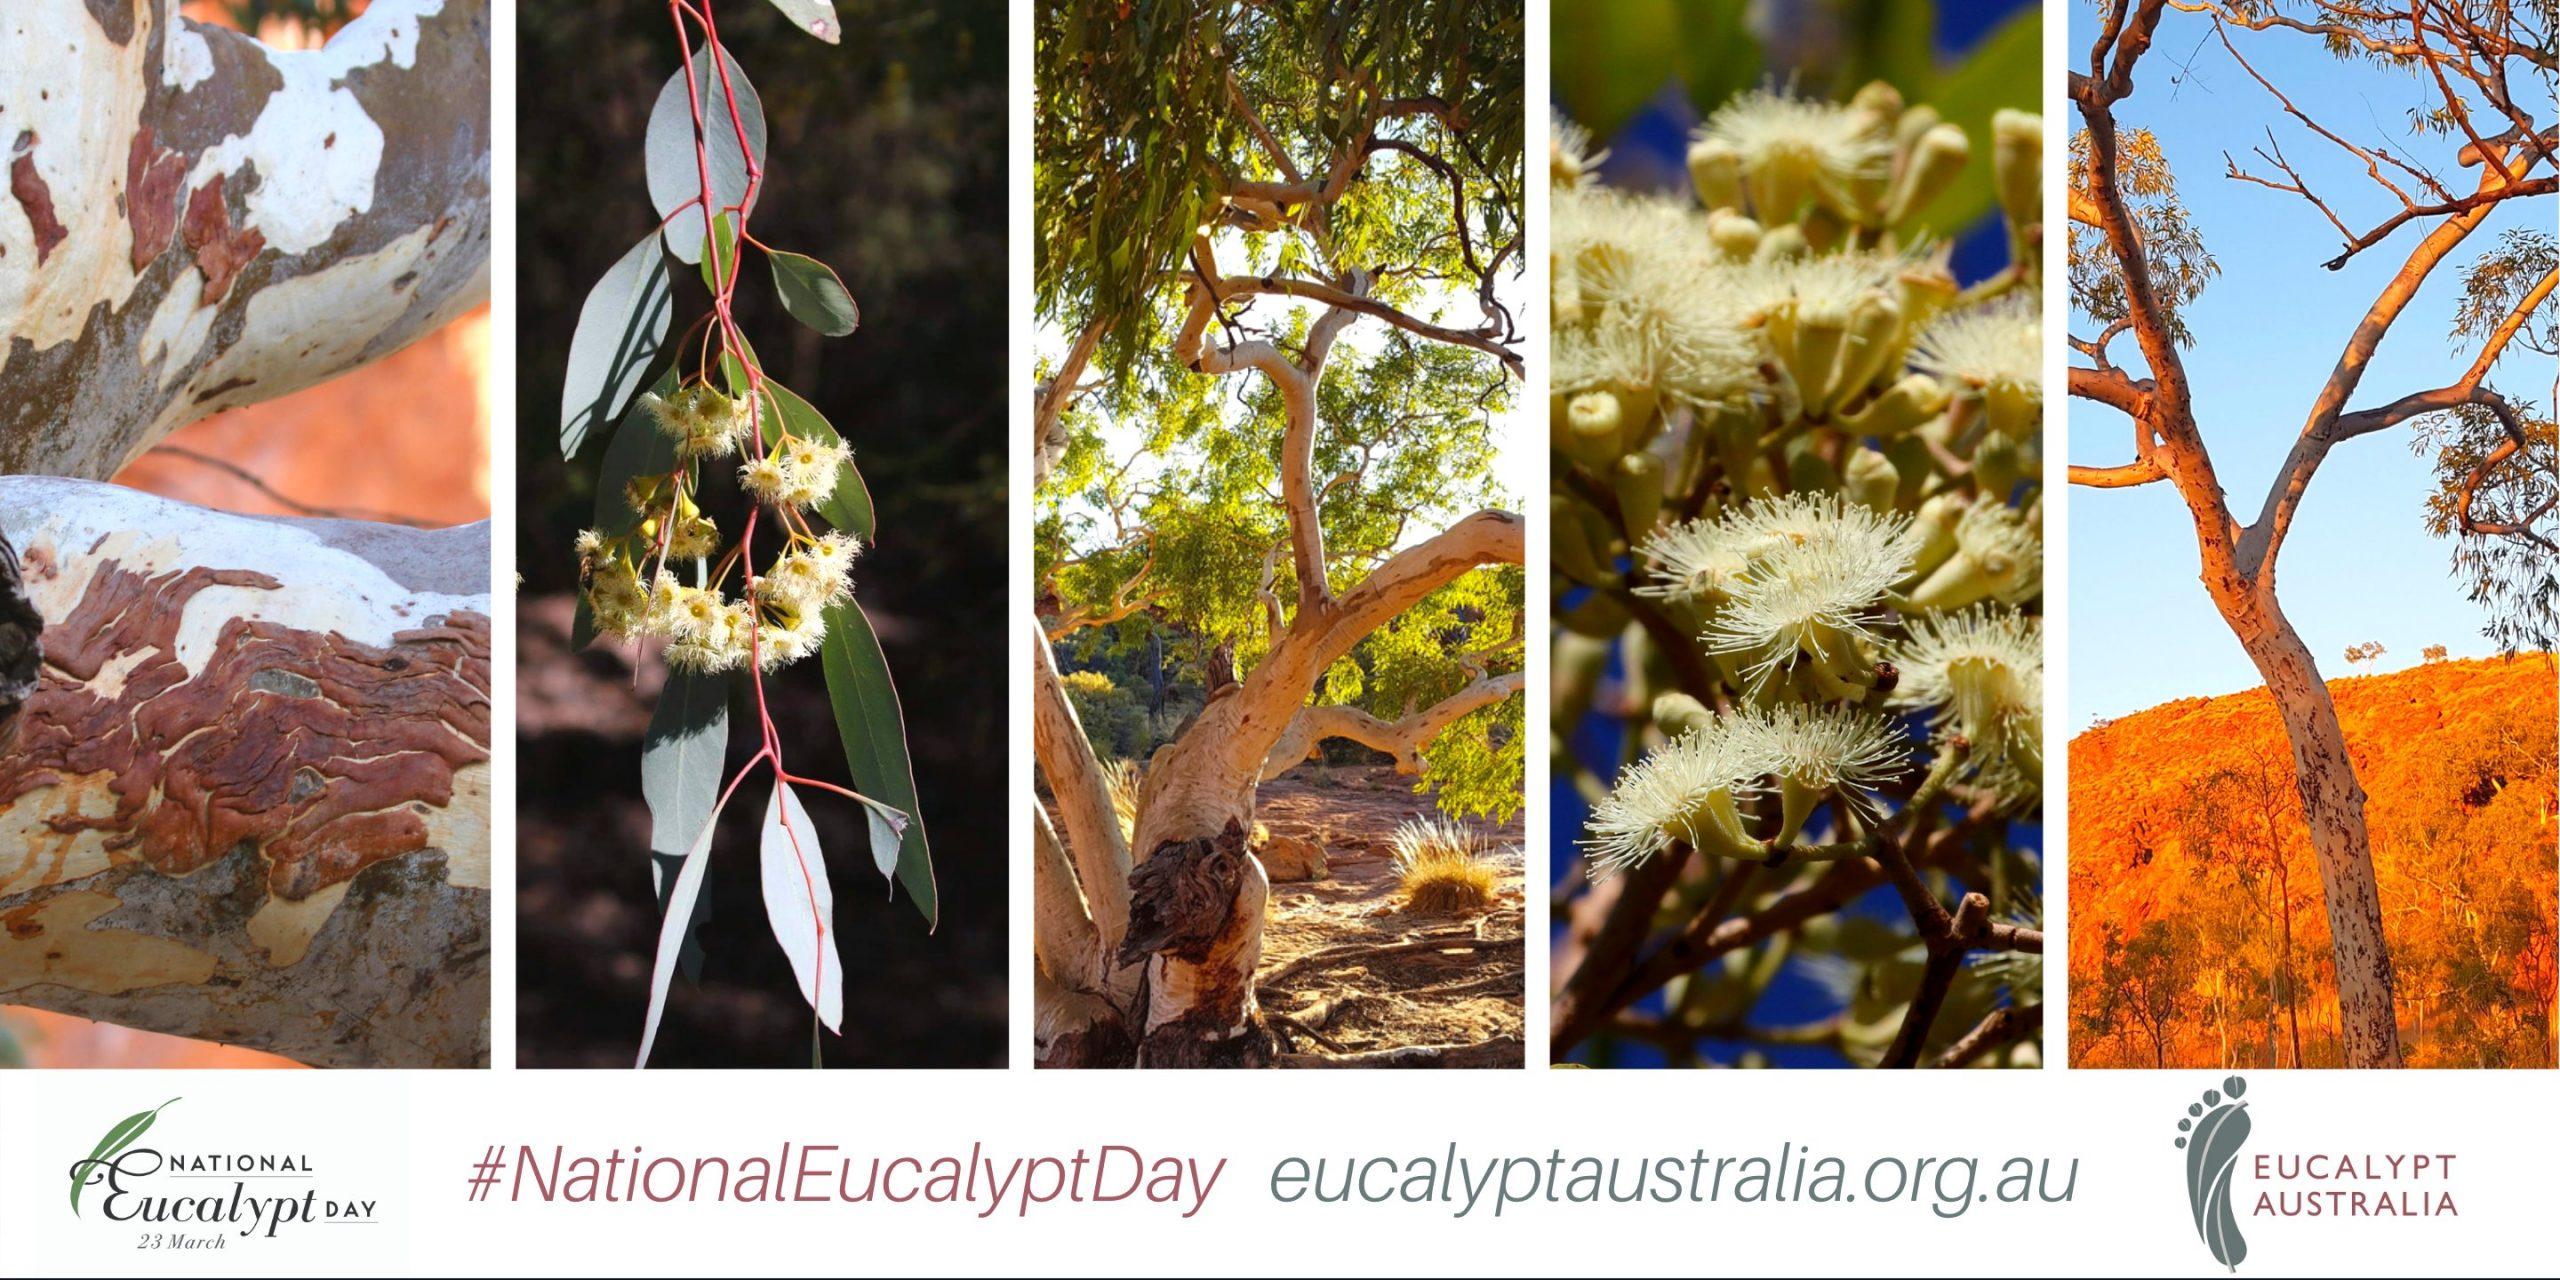 National Eucalypt Day